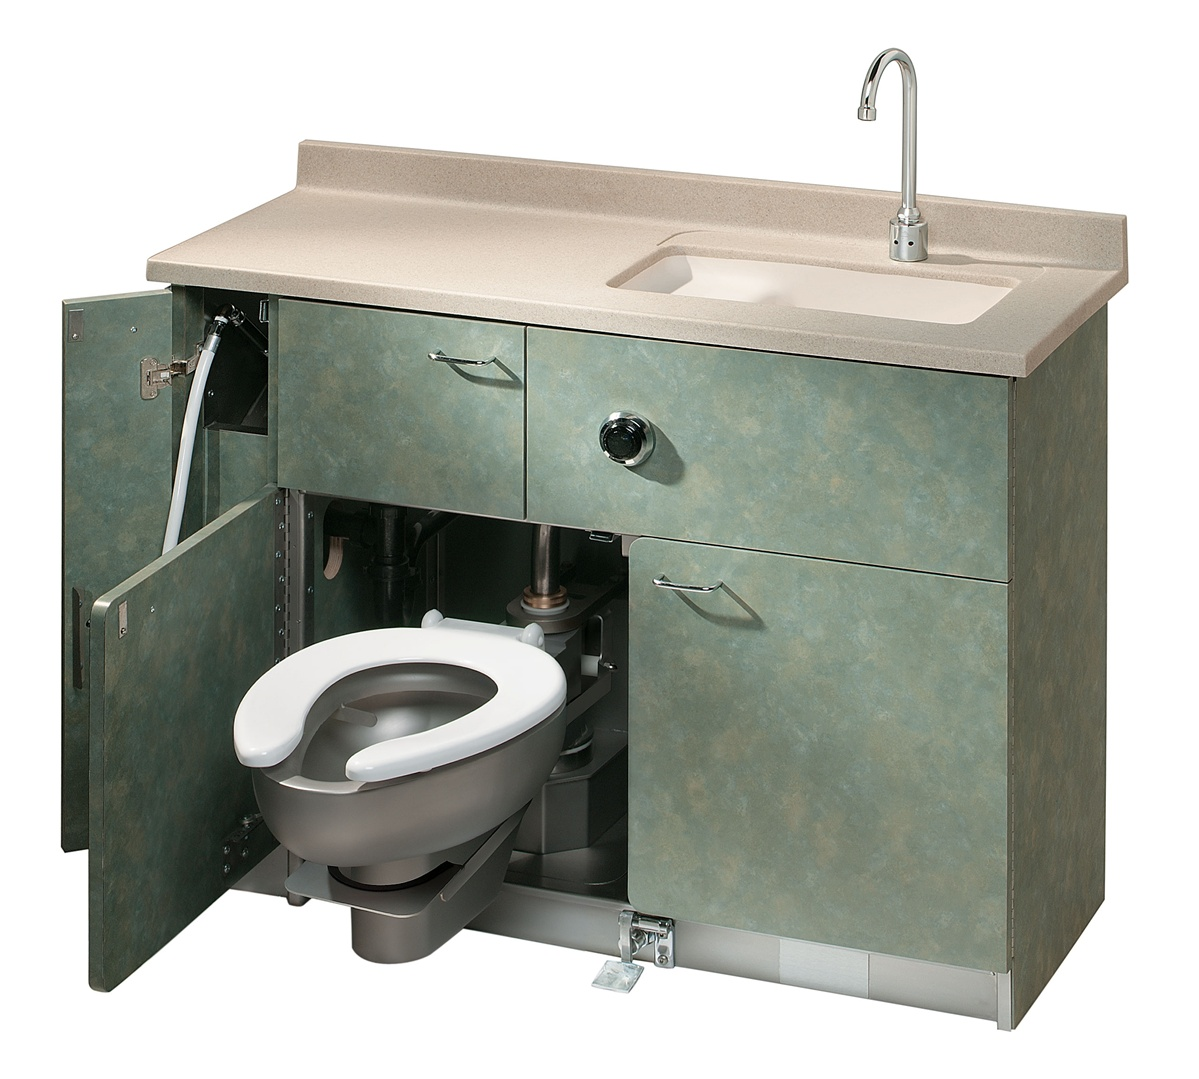 LC750,Bradley Washroom Equipment,LavCare 750 Patient Care unit